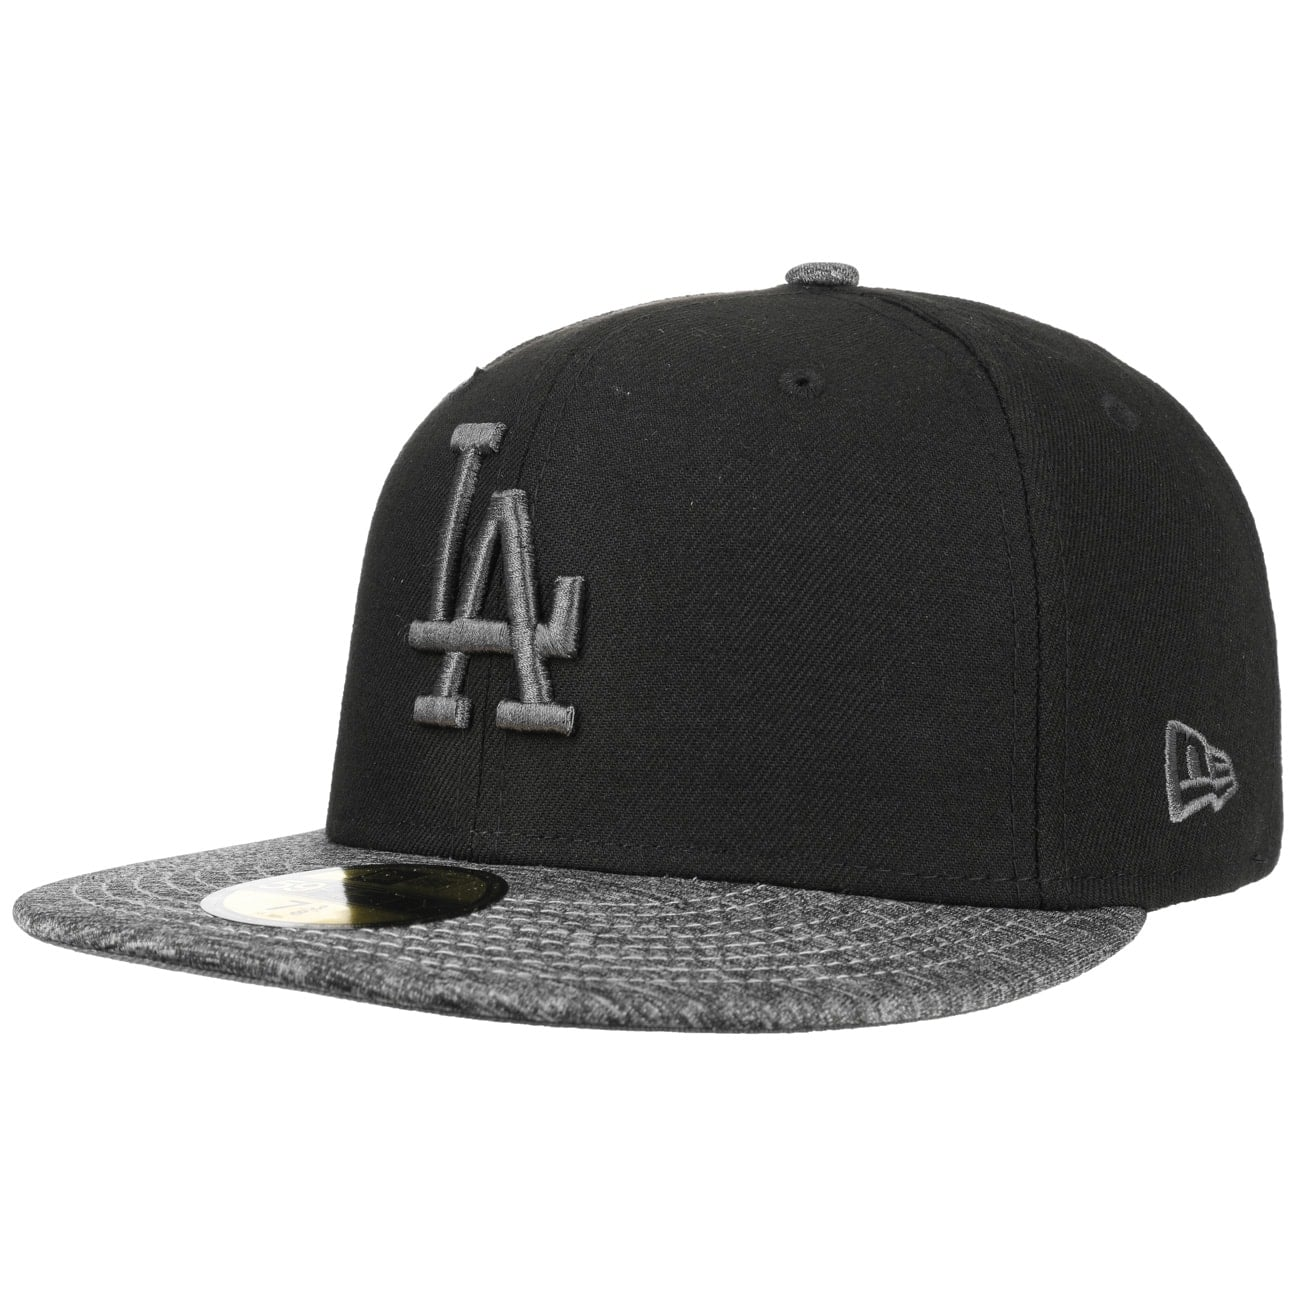 Gorra 59Fifty GC Dodgers by New Era  gorra de baseball